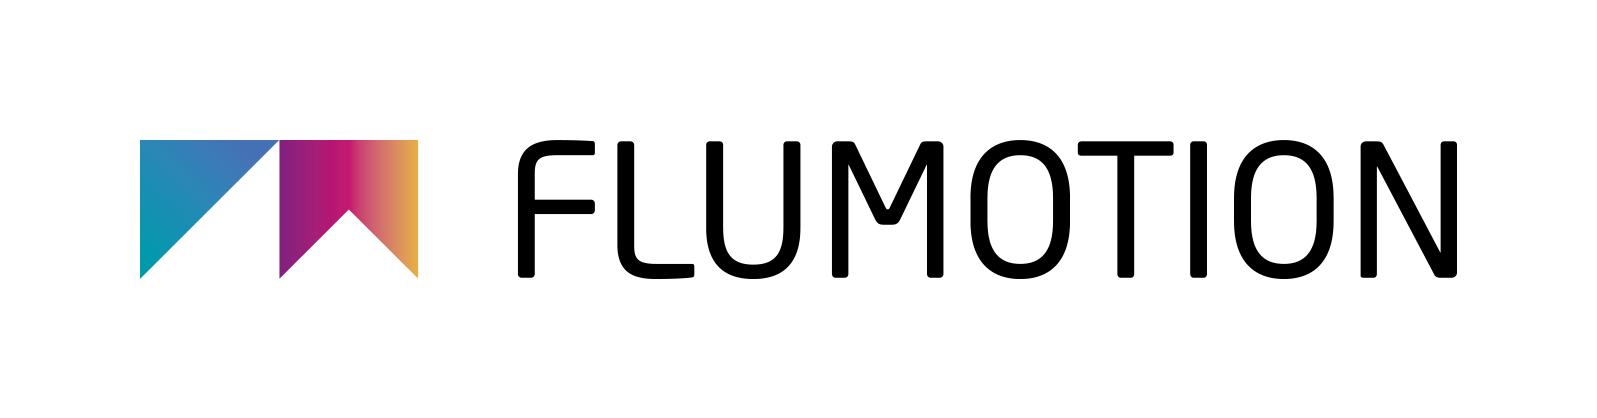 Flumotion - Logotipo - Horizontal - RGB - AF